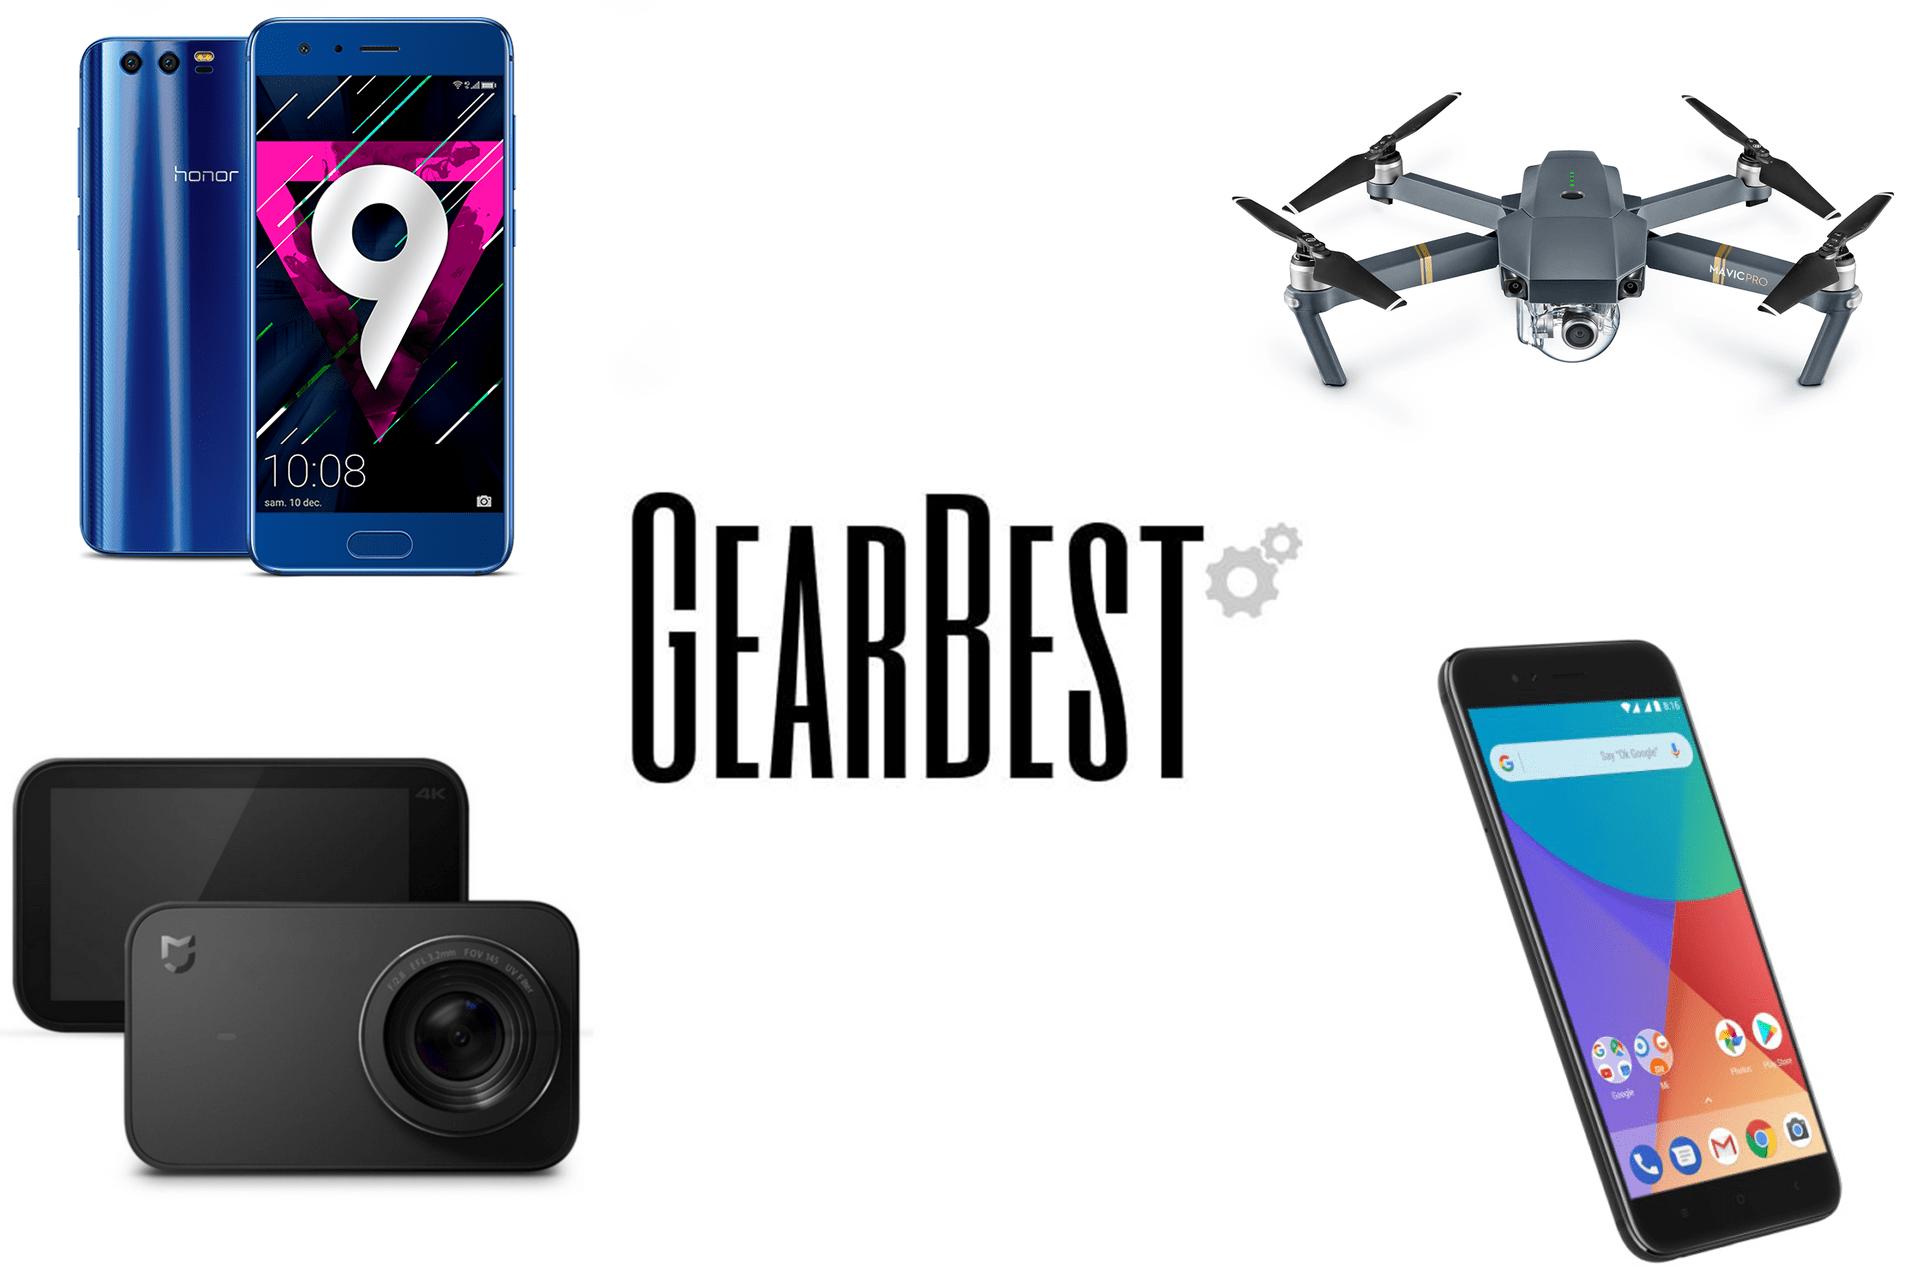 5 offres de la semaine sur GearBest : Honor 9, DJI Mavic Pro, Xiaomi Mi A1 et Mijia Cam